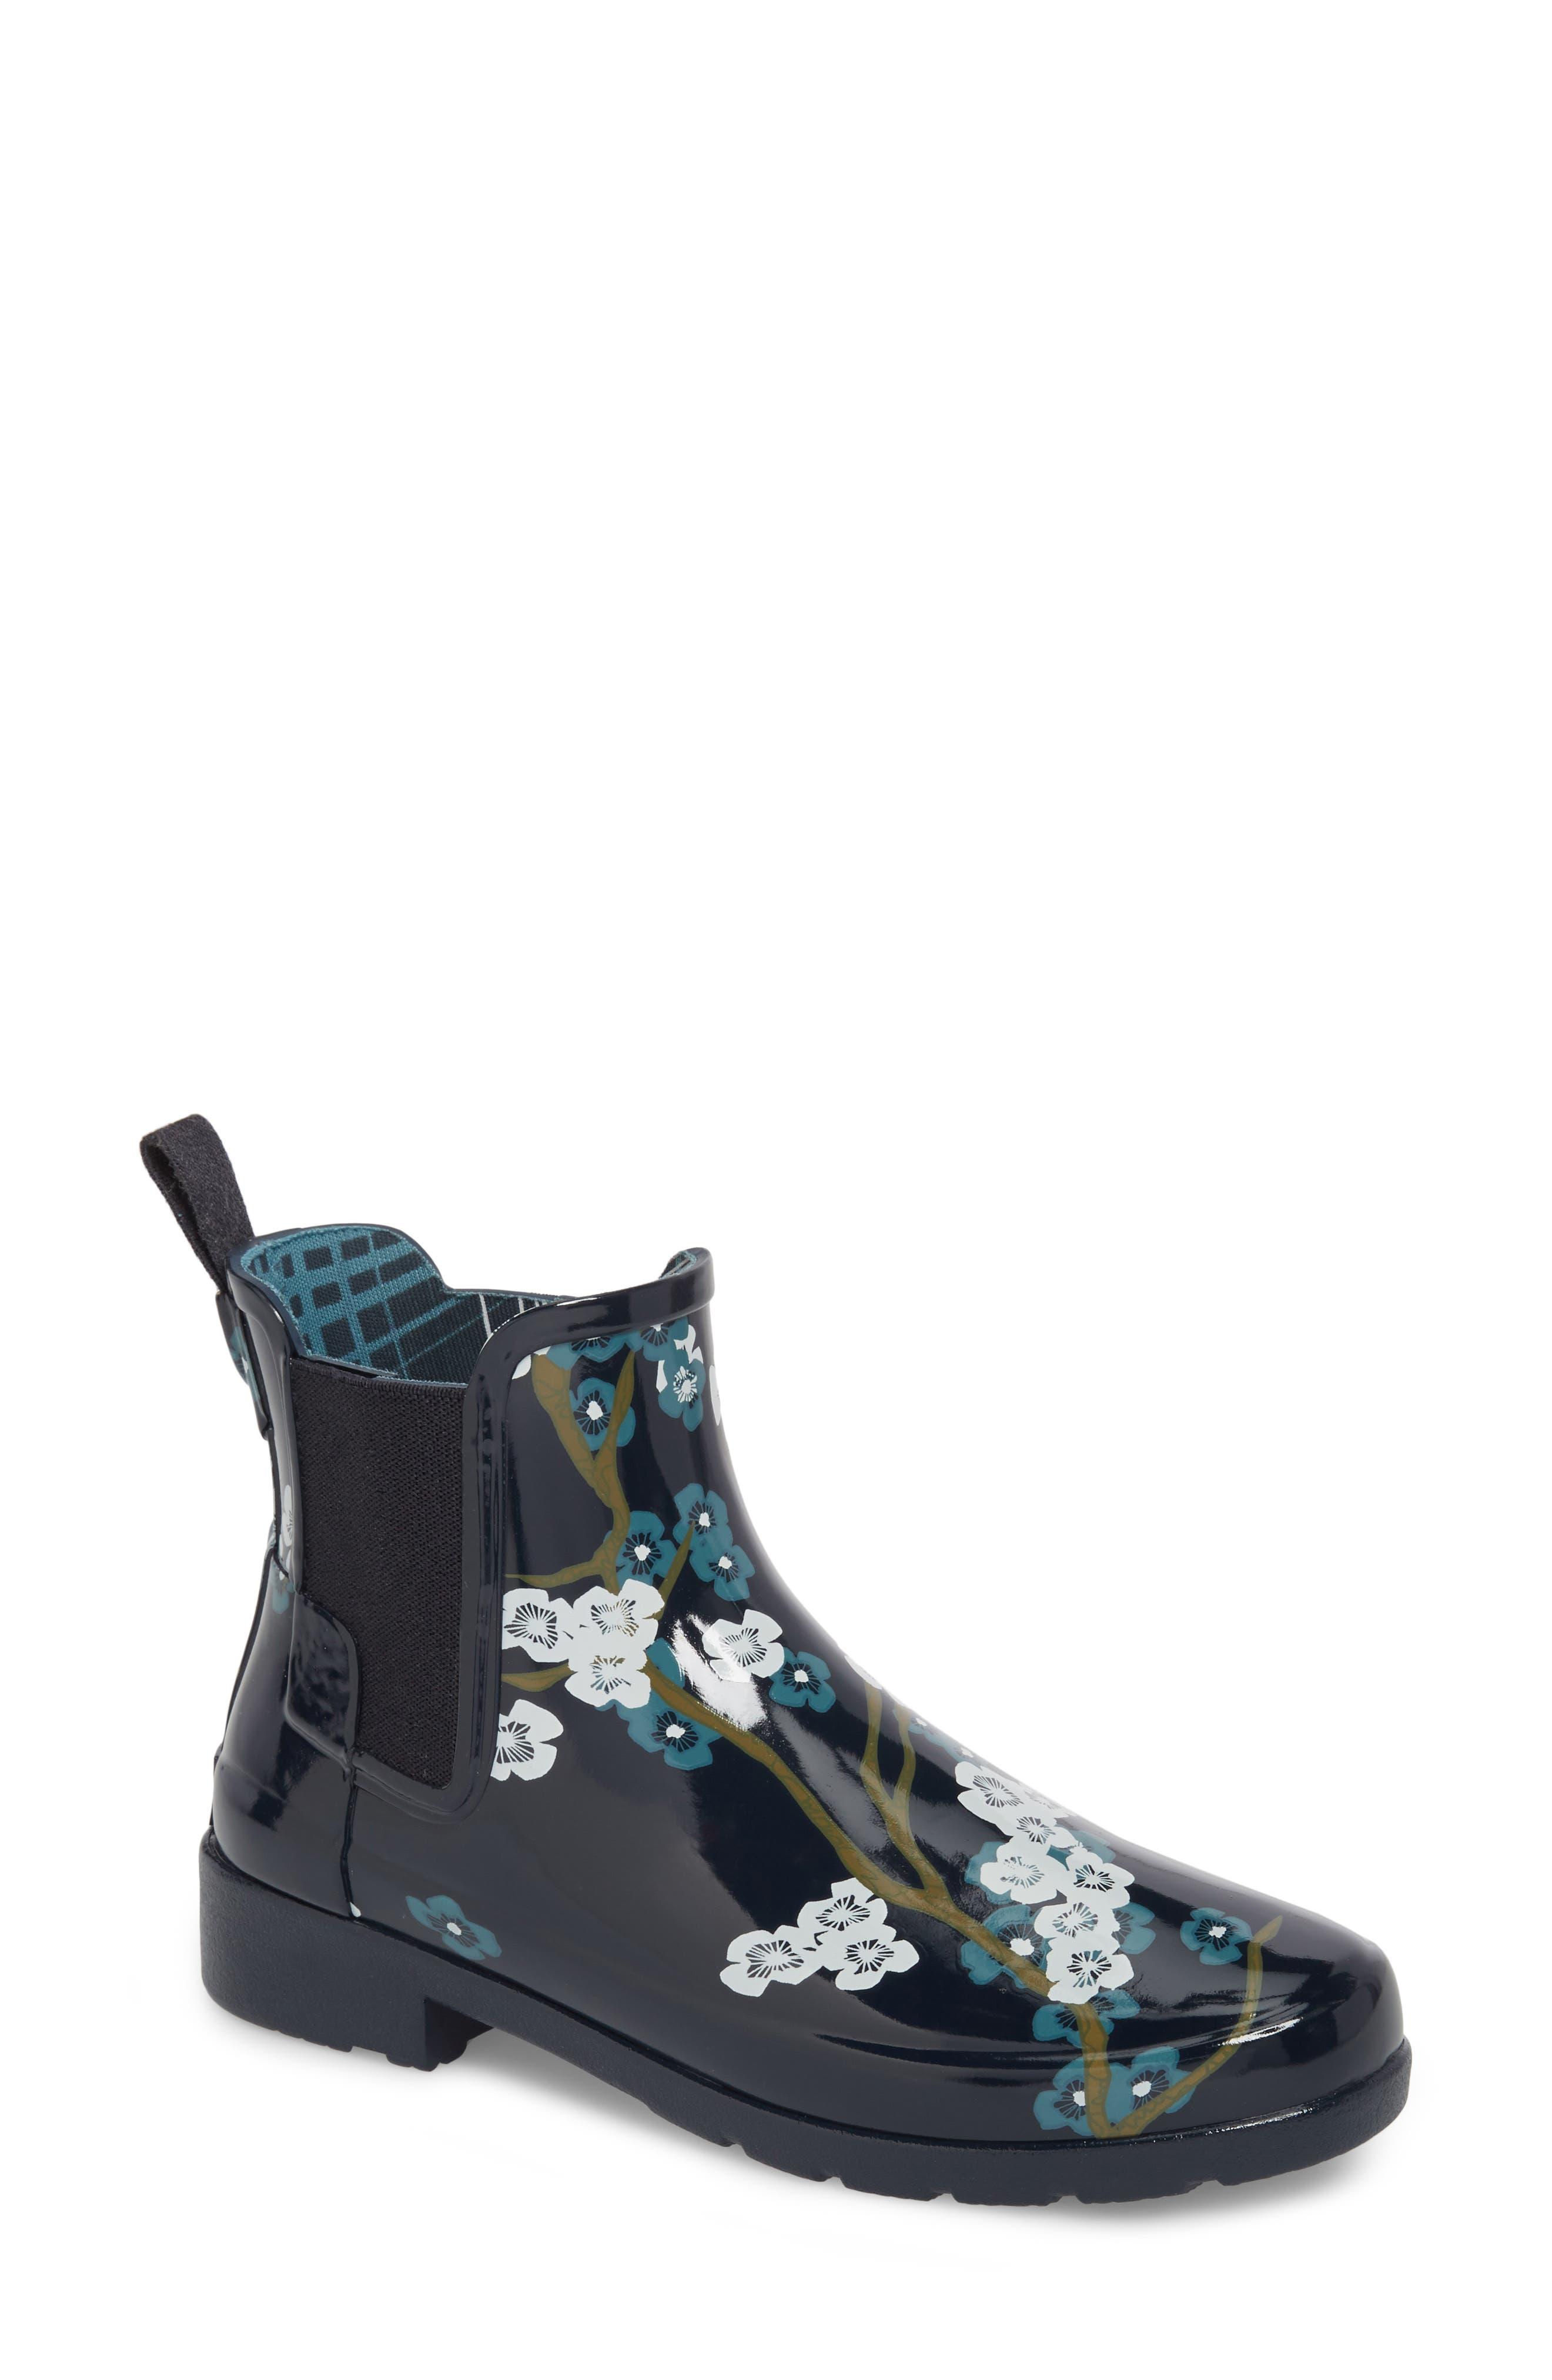 Alternate Image 1 Selected - Hunter 'Original Refined' Chelsea Rain Boot (Women)